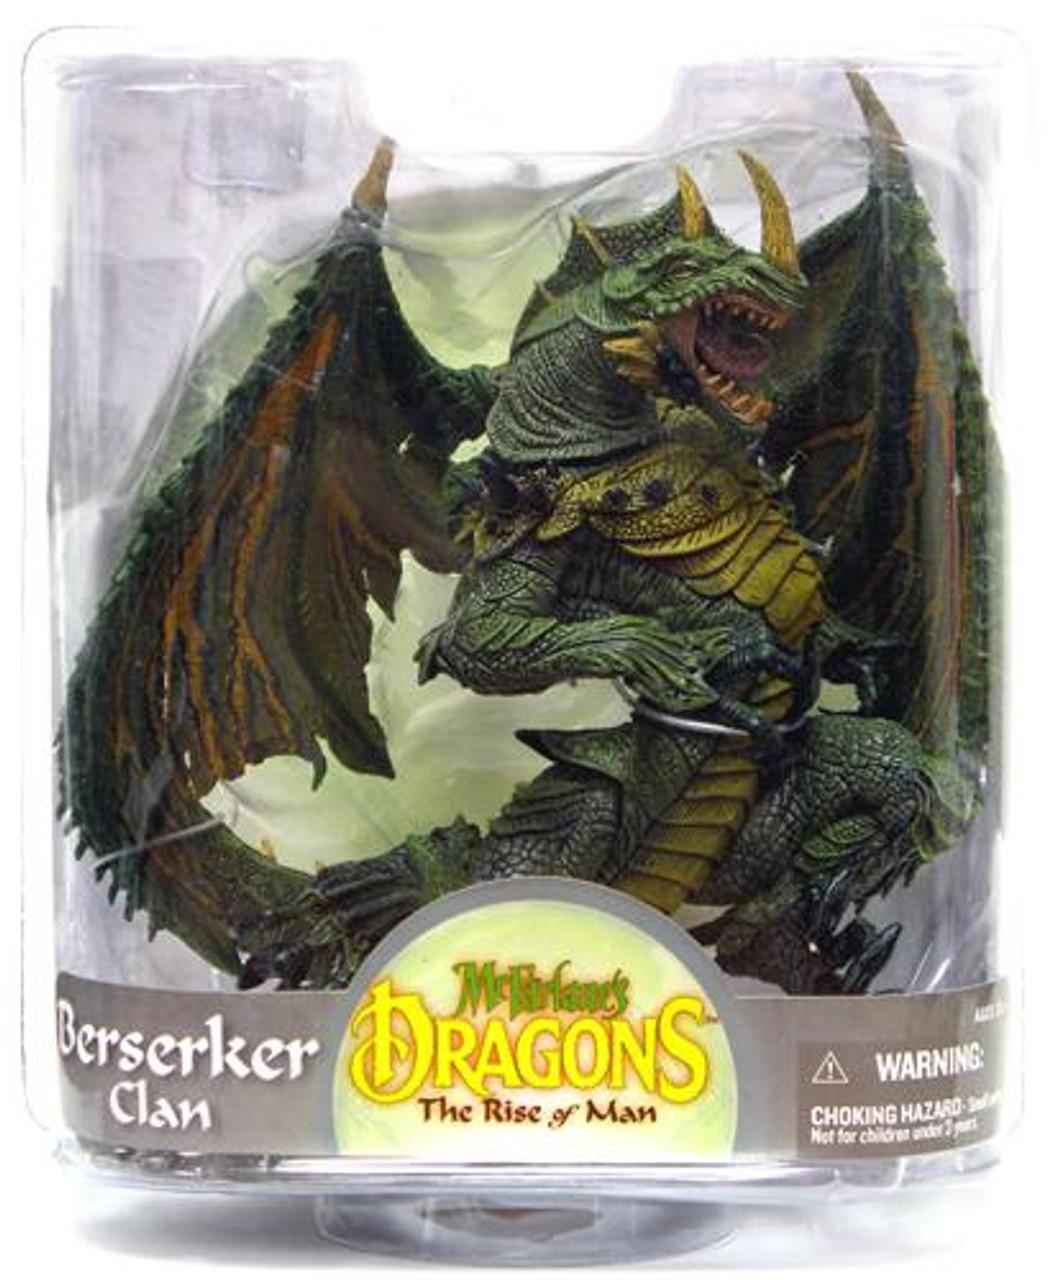 McFarlane Toys Dragons The Rise of Man Series 7 Berserker Dragon Action Figure